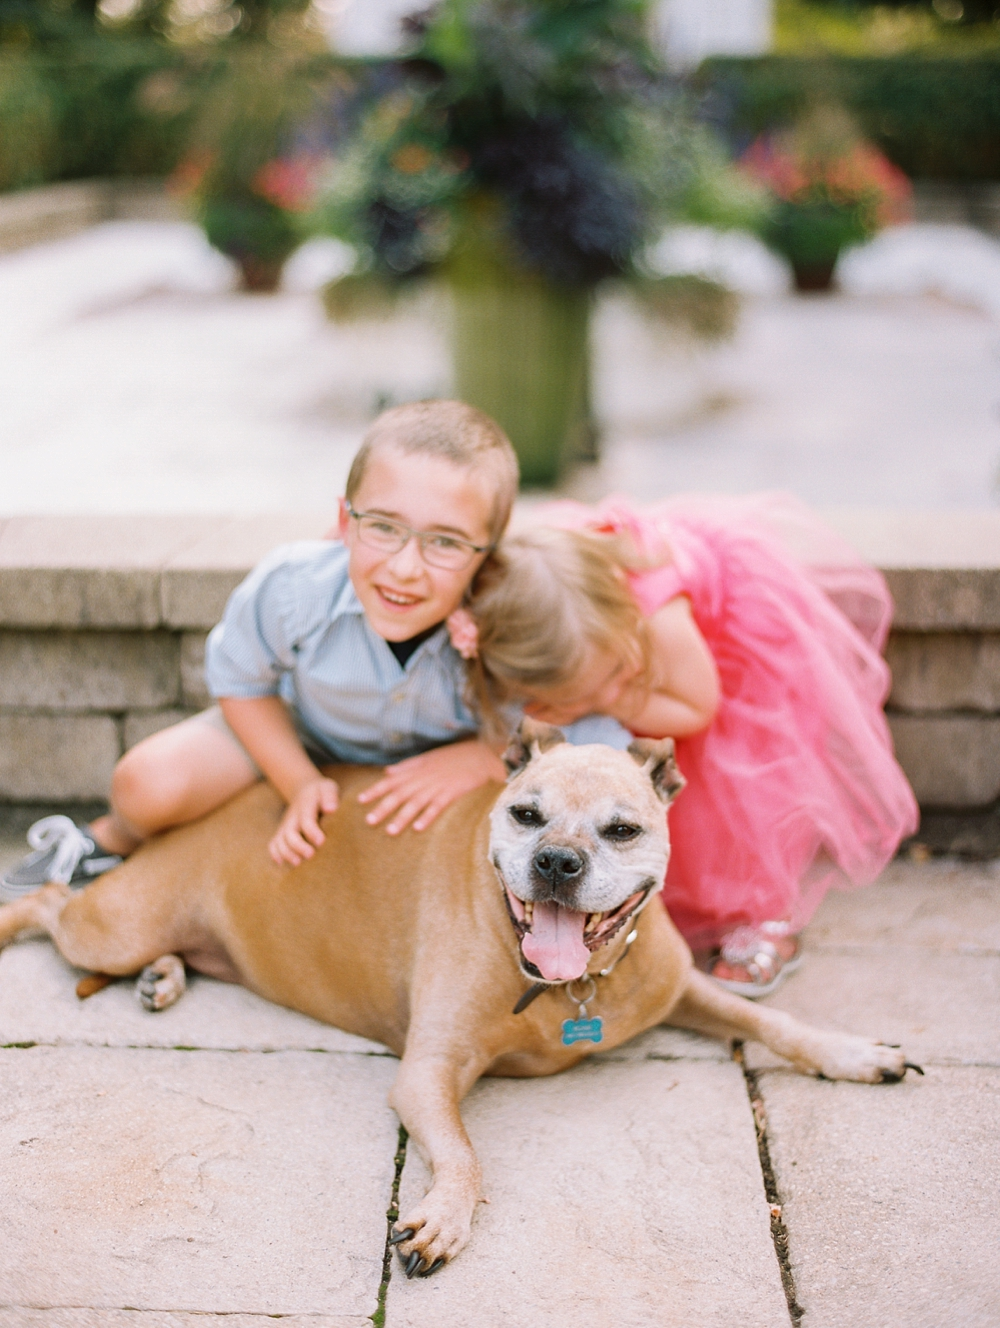 kristin-la-voie-photography-lifestyle-chicago-dog-18